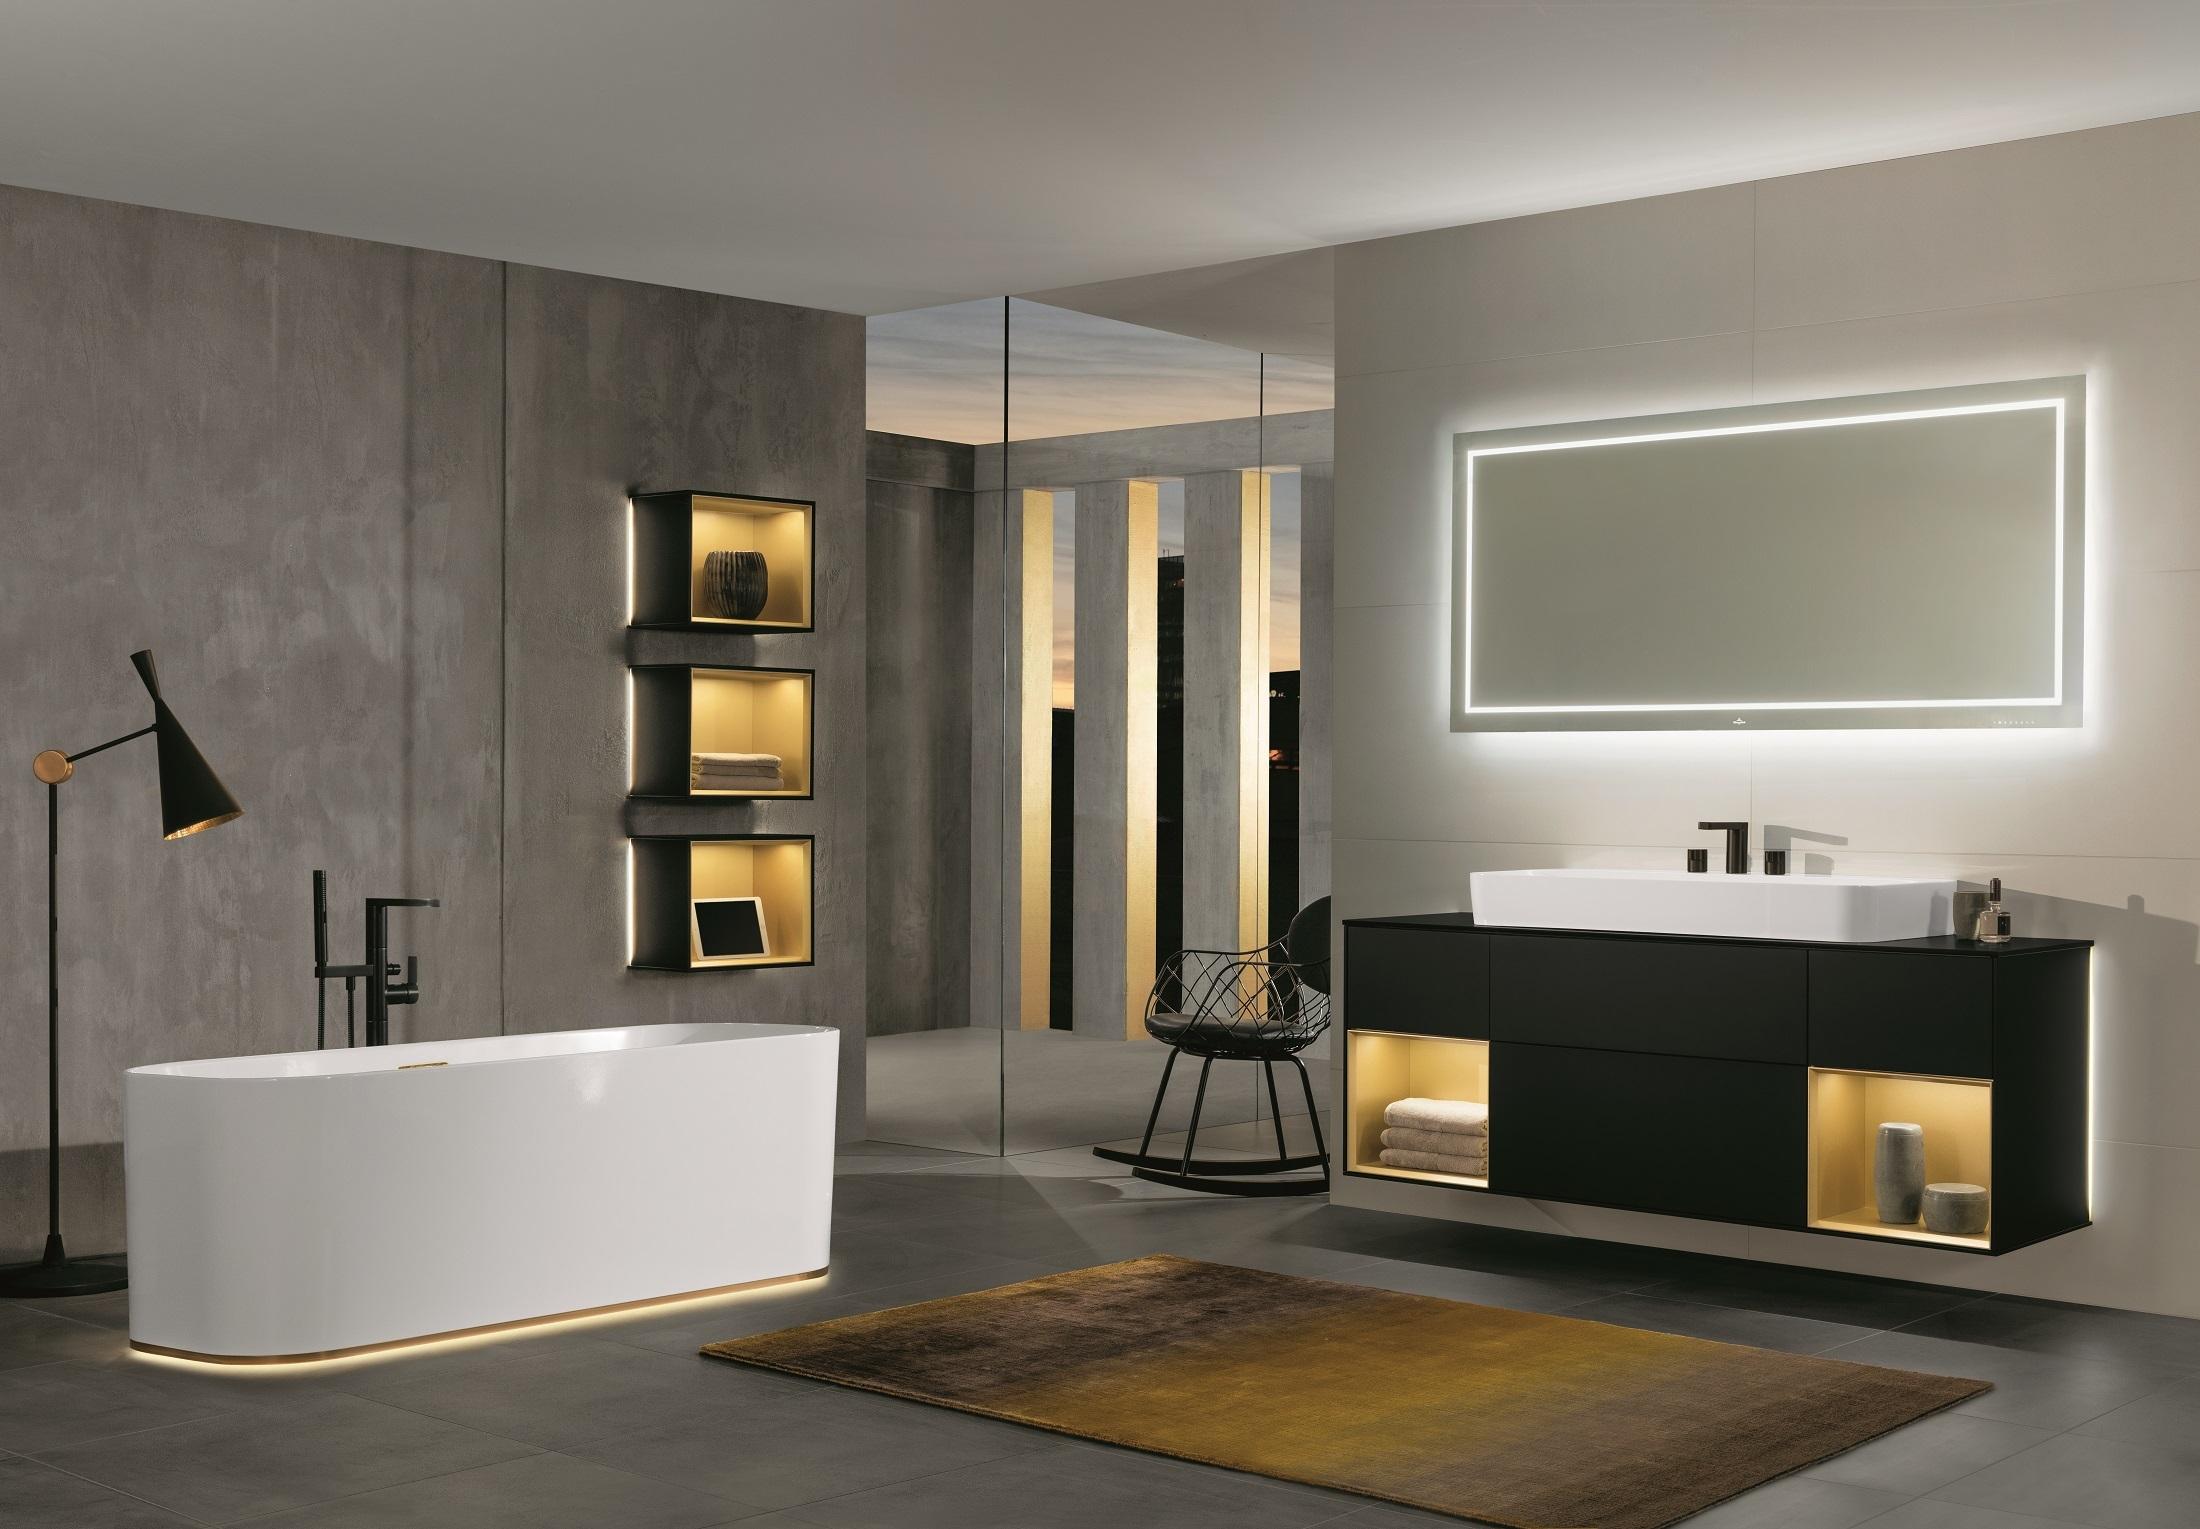 Badewanne finion von villeroy boch bad wellness stylepark for Villeroy and boch bathroom accessories